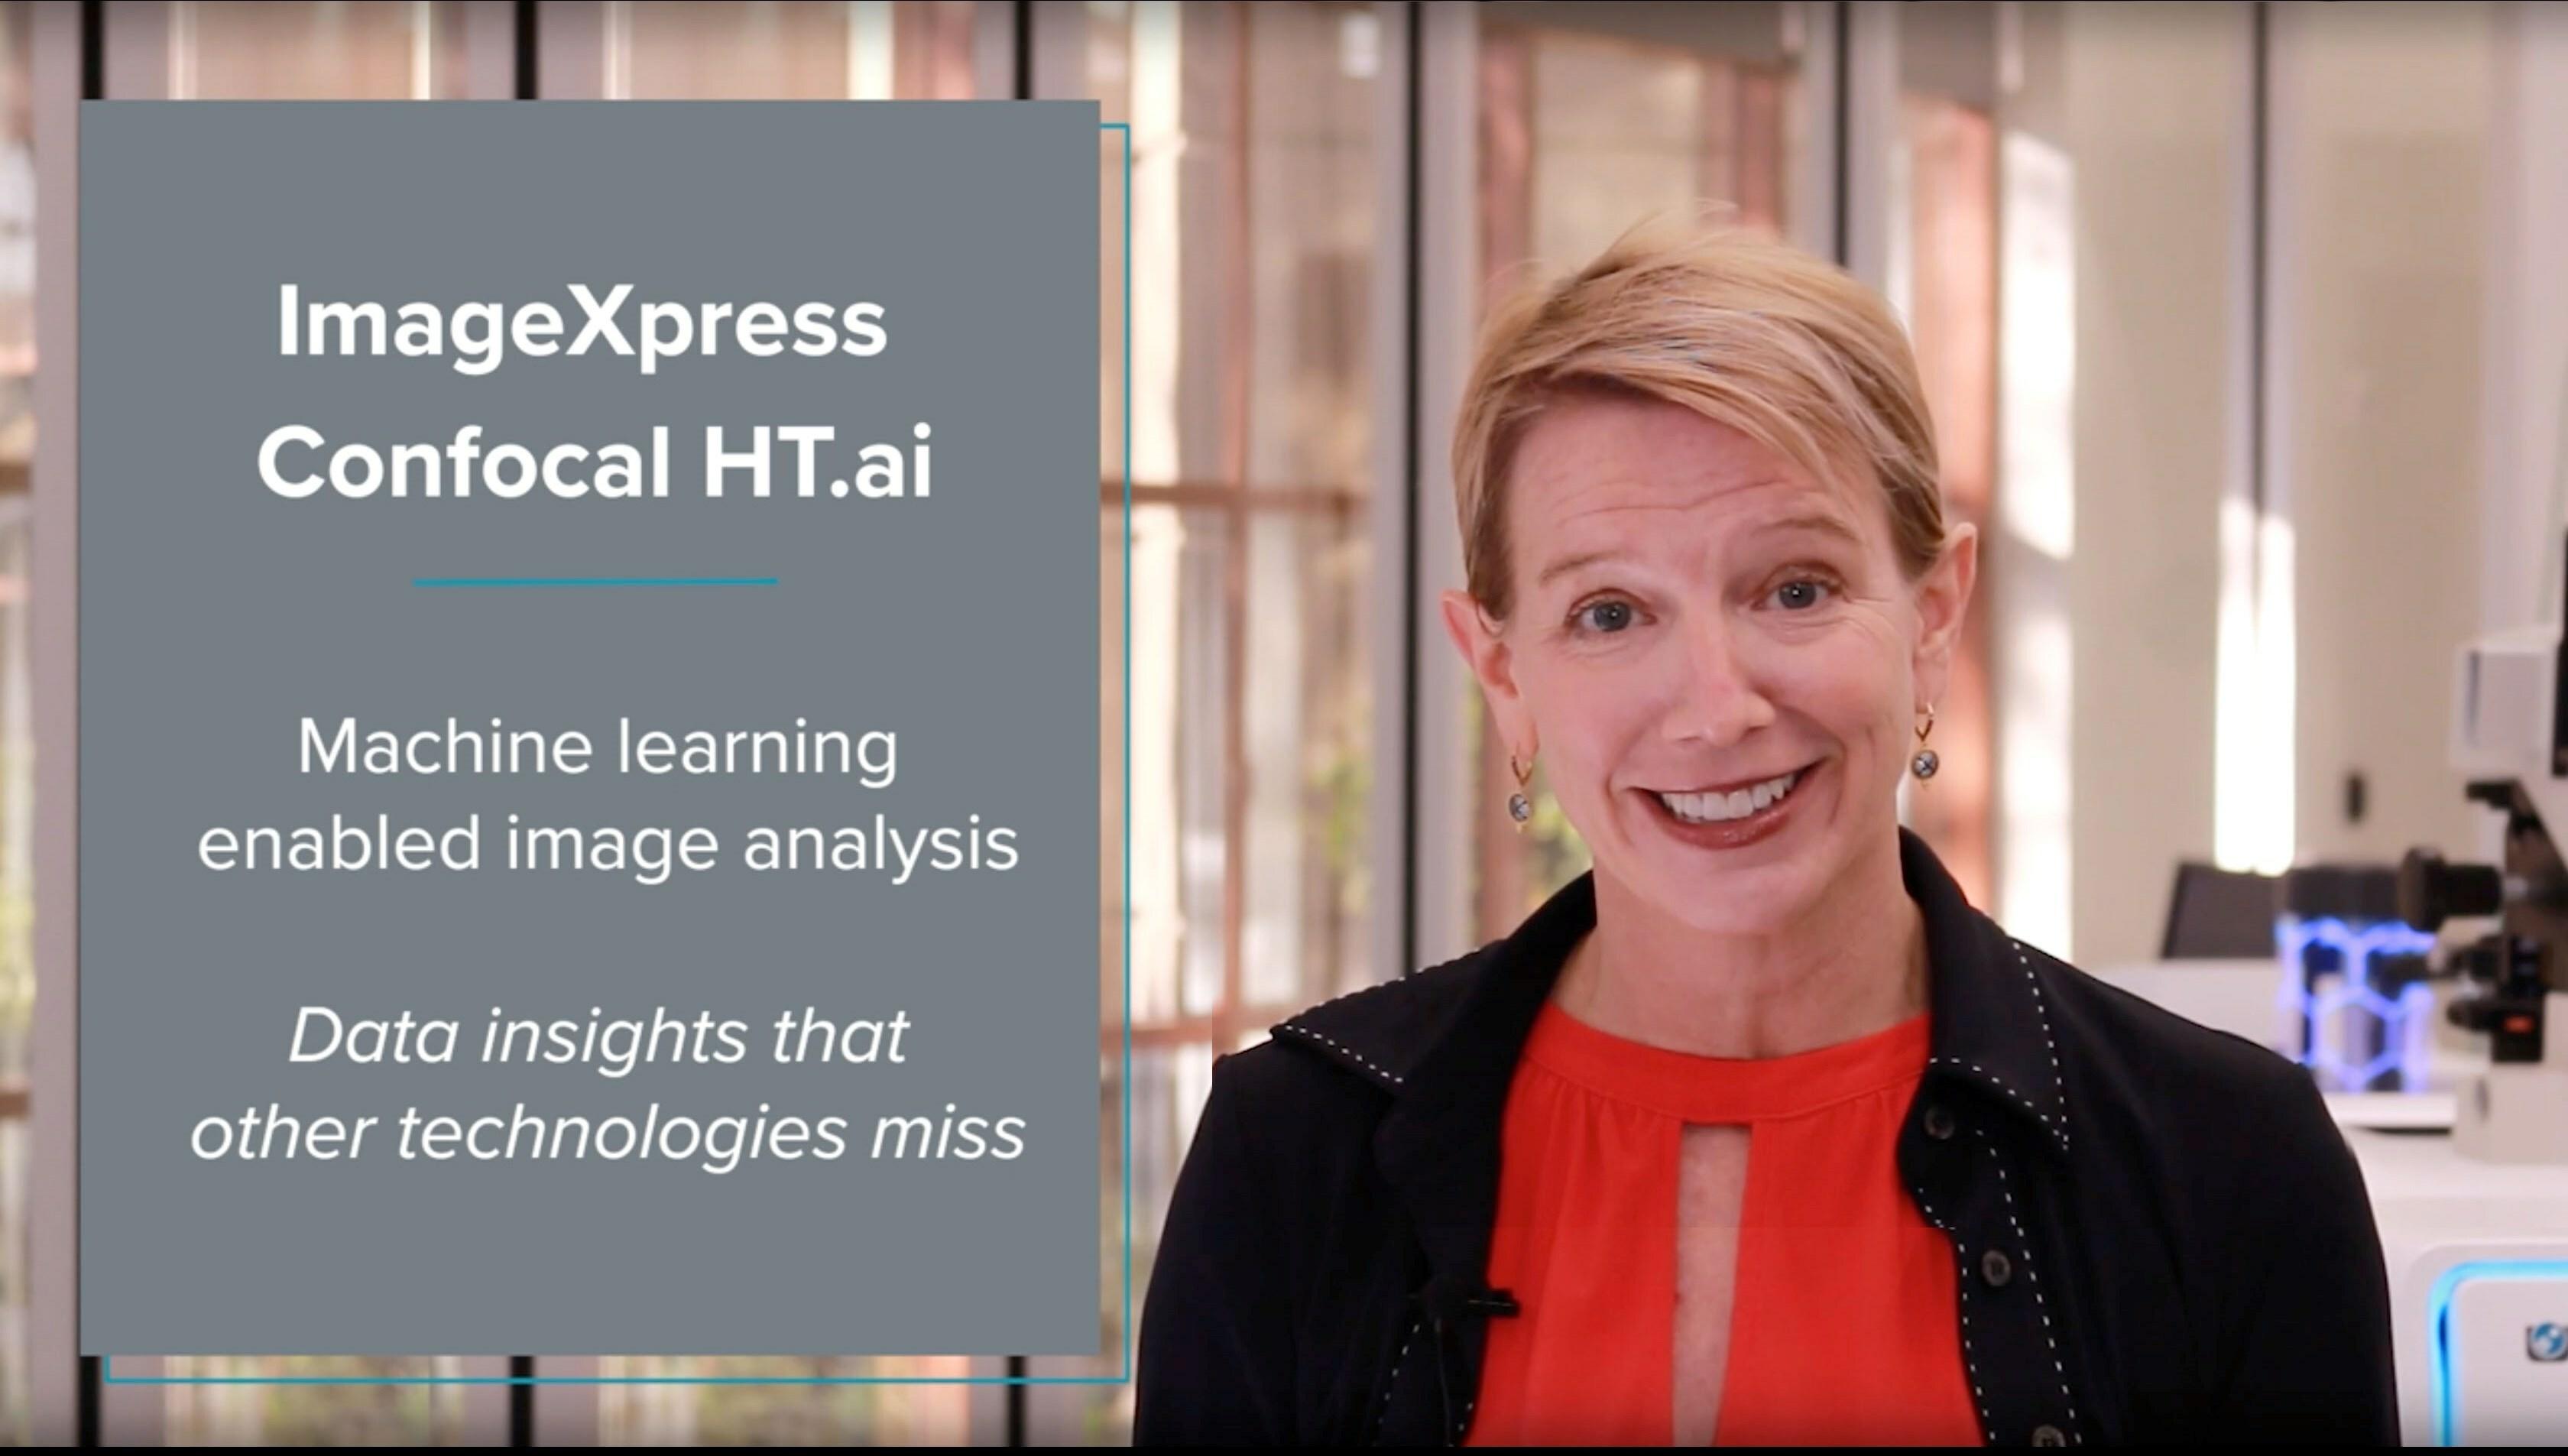 ImageXpress Confocal HT.ai system